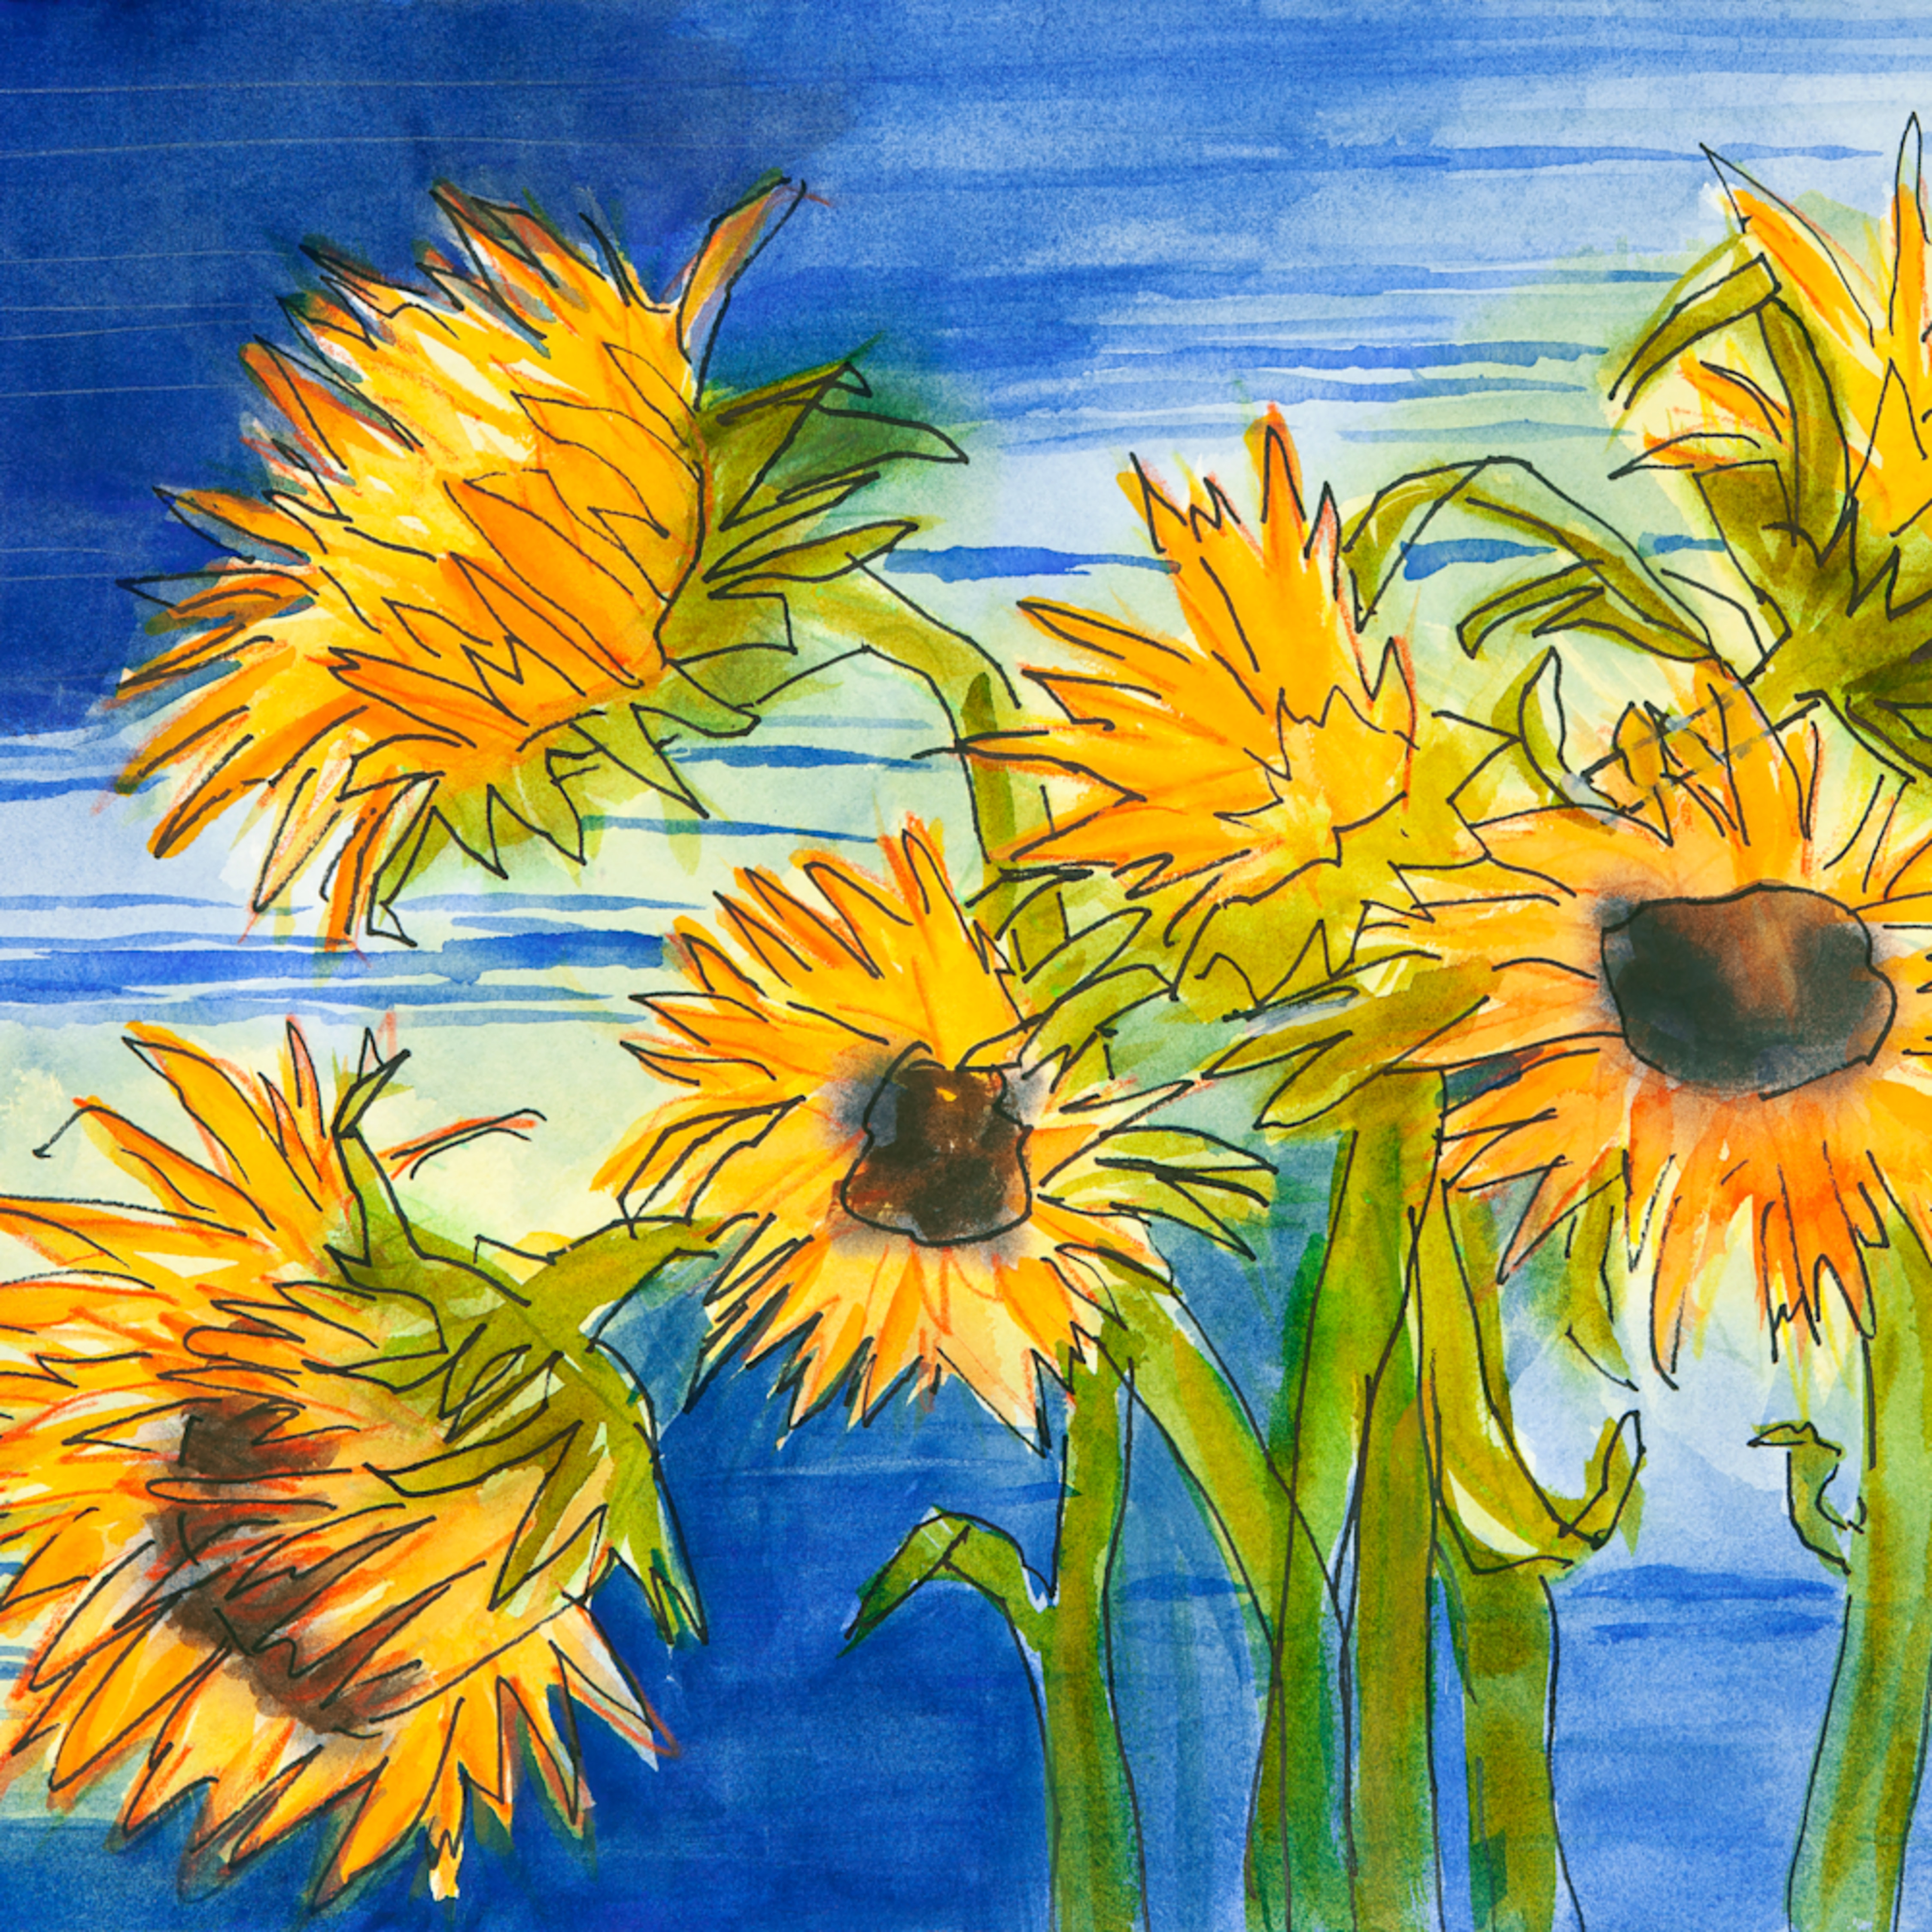 Sunflowers at the lake equg6g